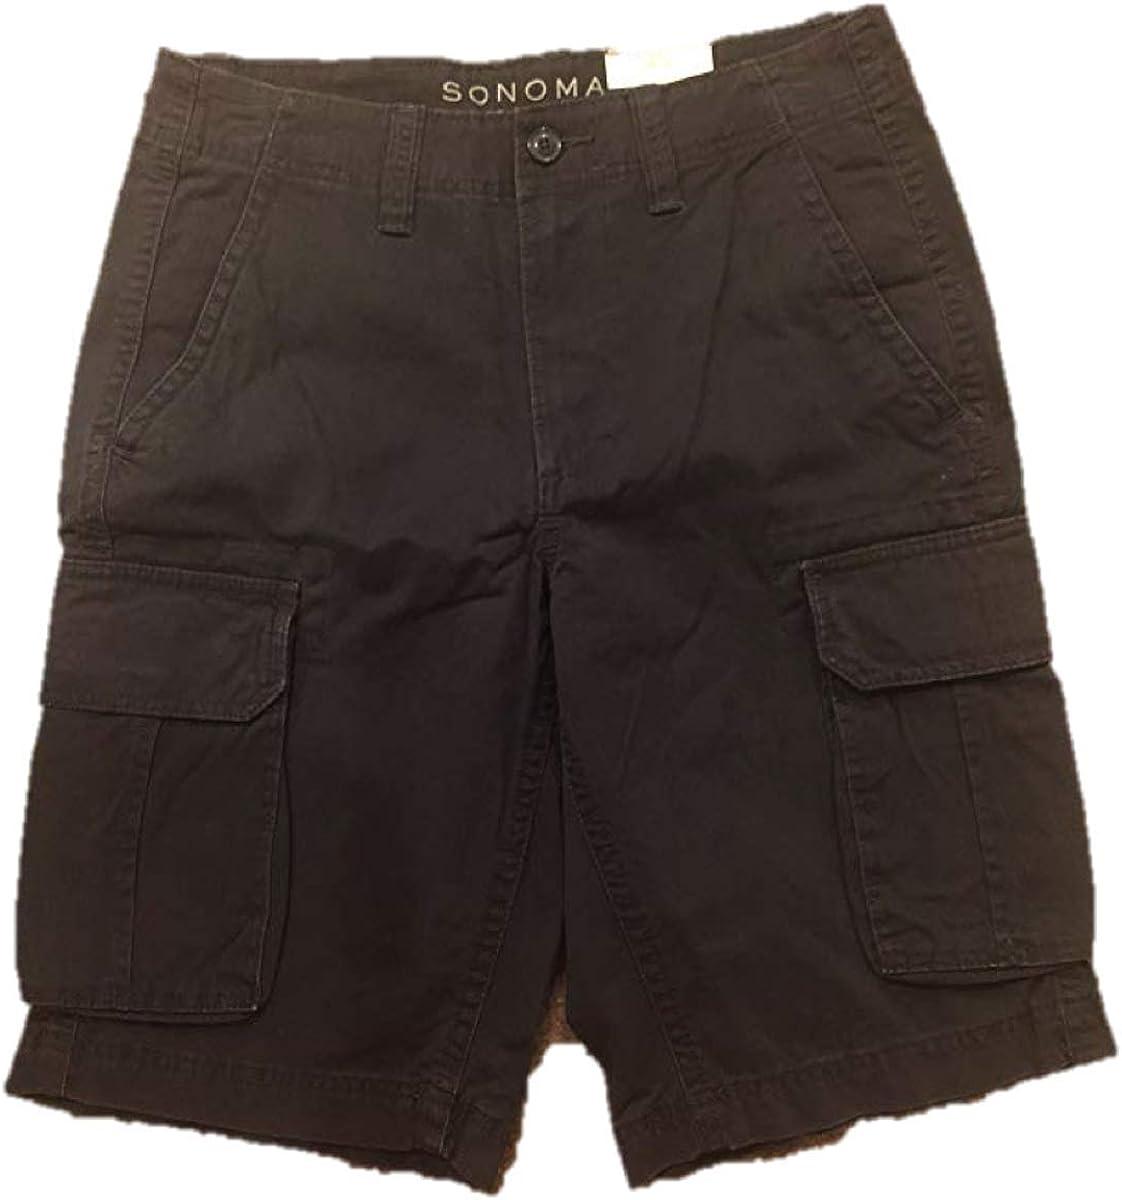 Sonoma Mens Flat Front Cargo Shorts Size 30